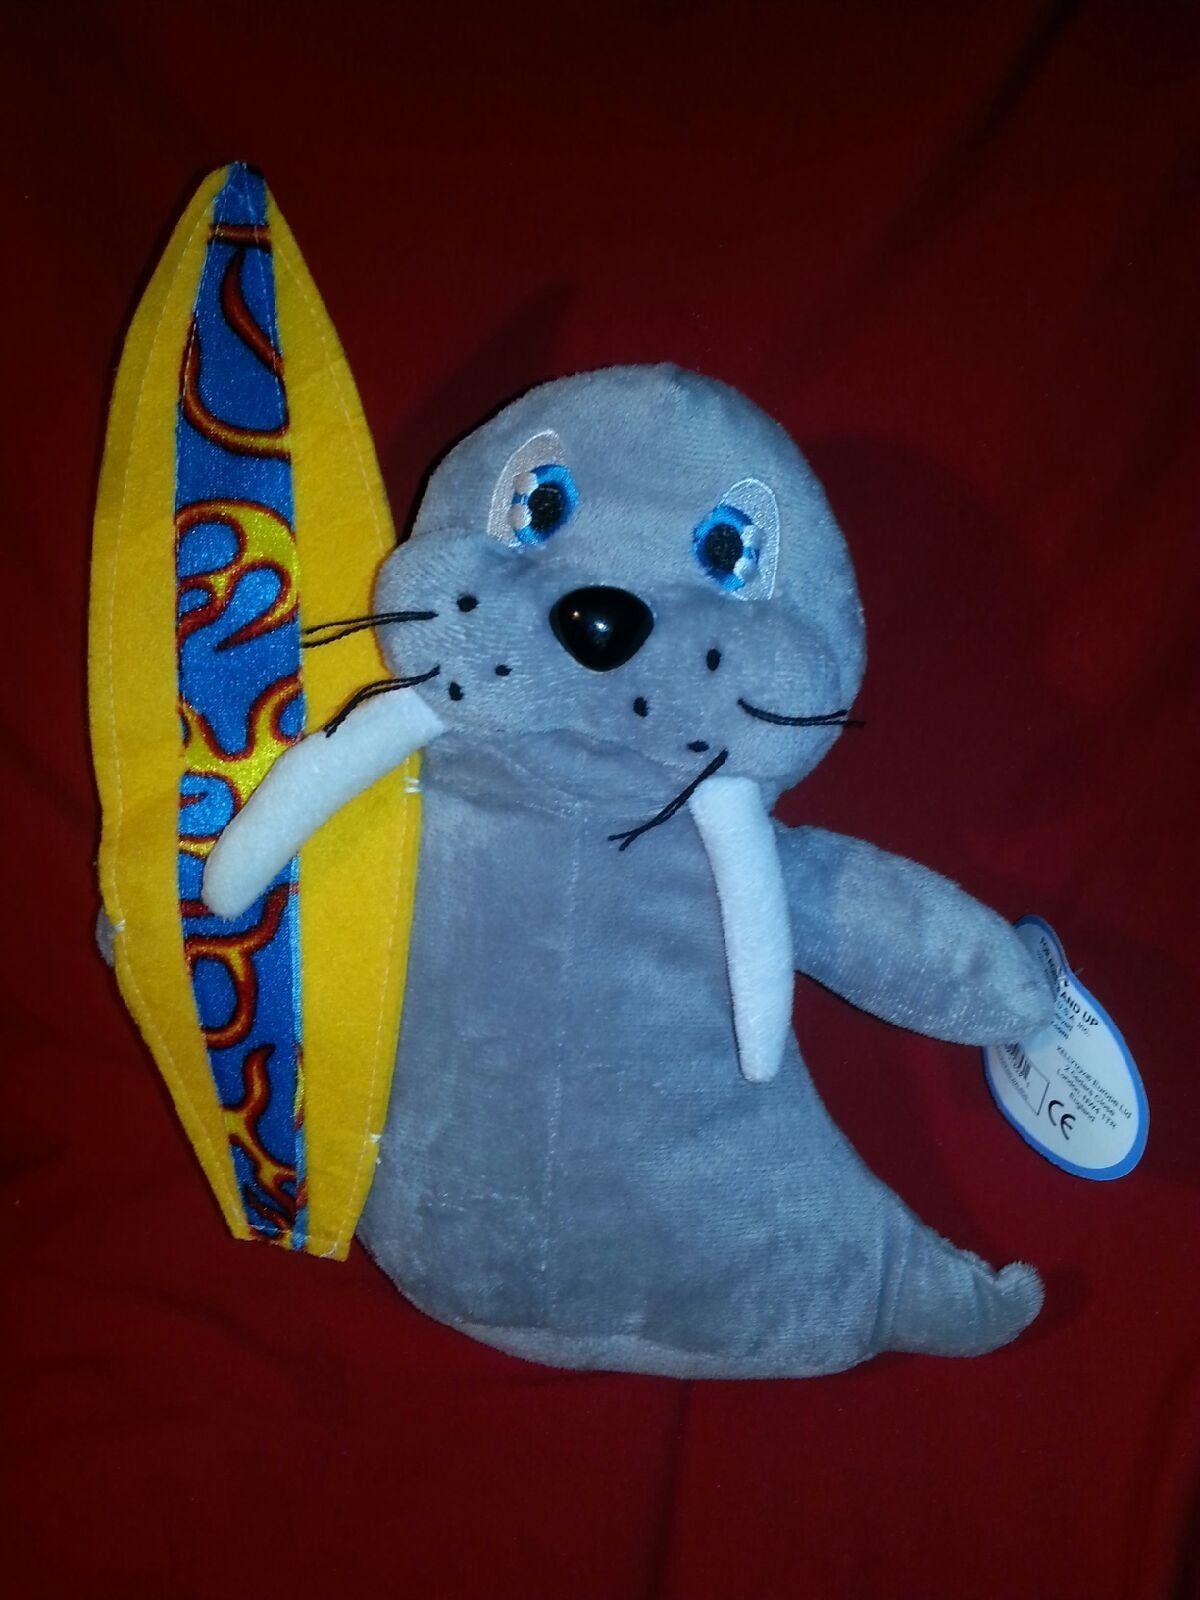 Boys Plush Toys : Kellytoy quot surfing seal plush toy boys girls other